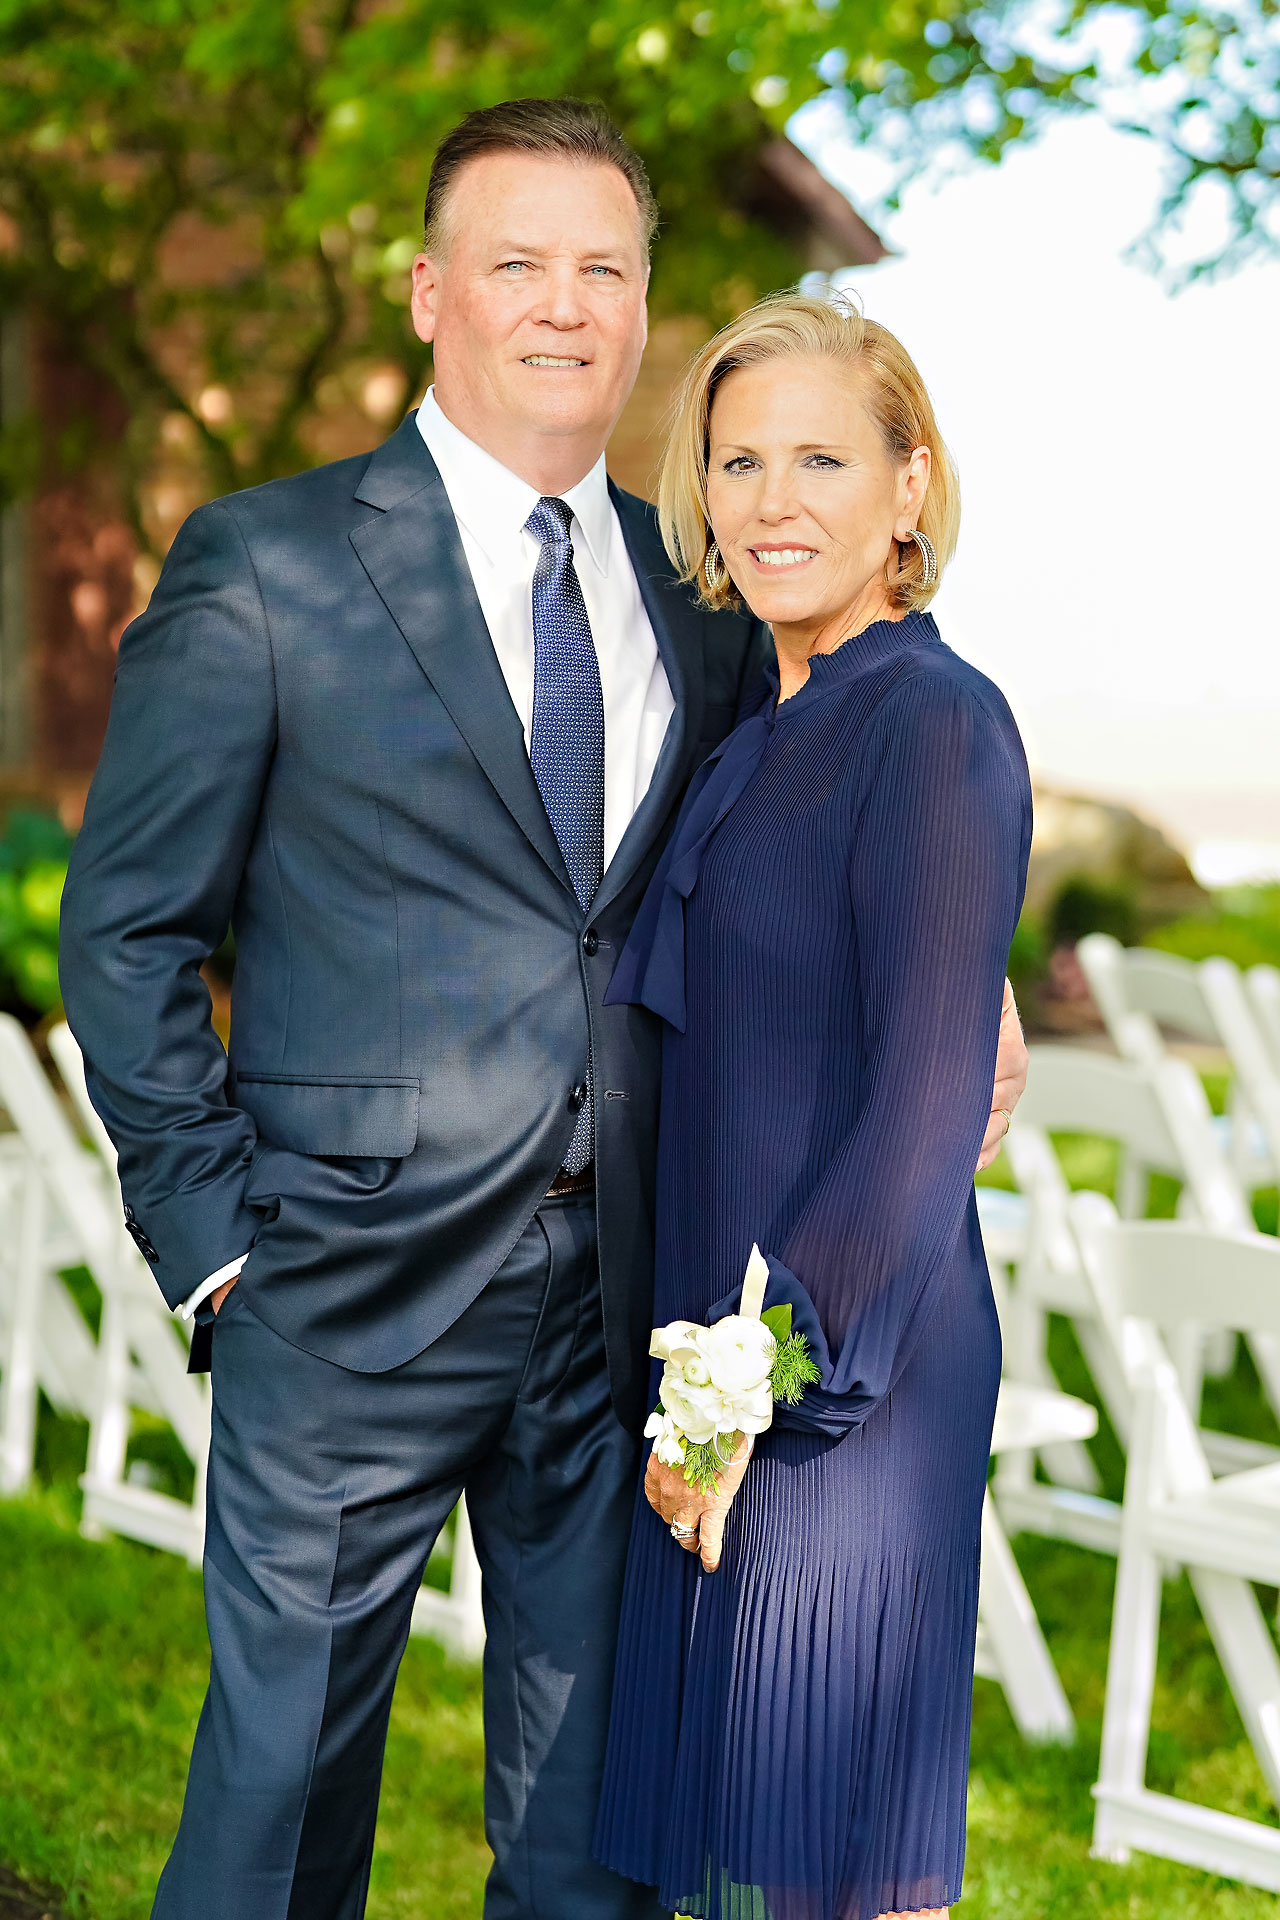 MacKinze John Lafayette Indiana Purdue Wedding 170